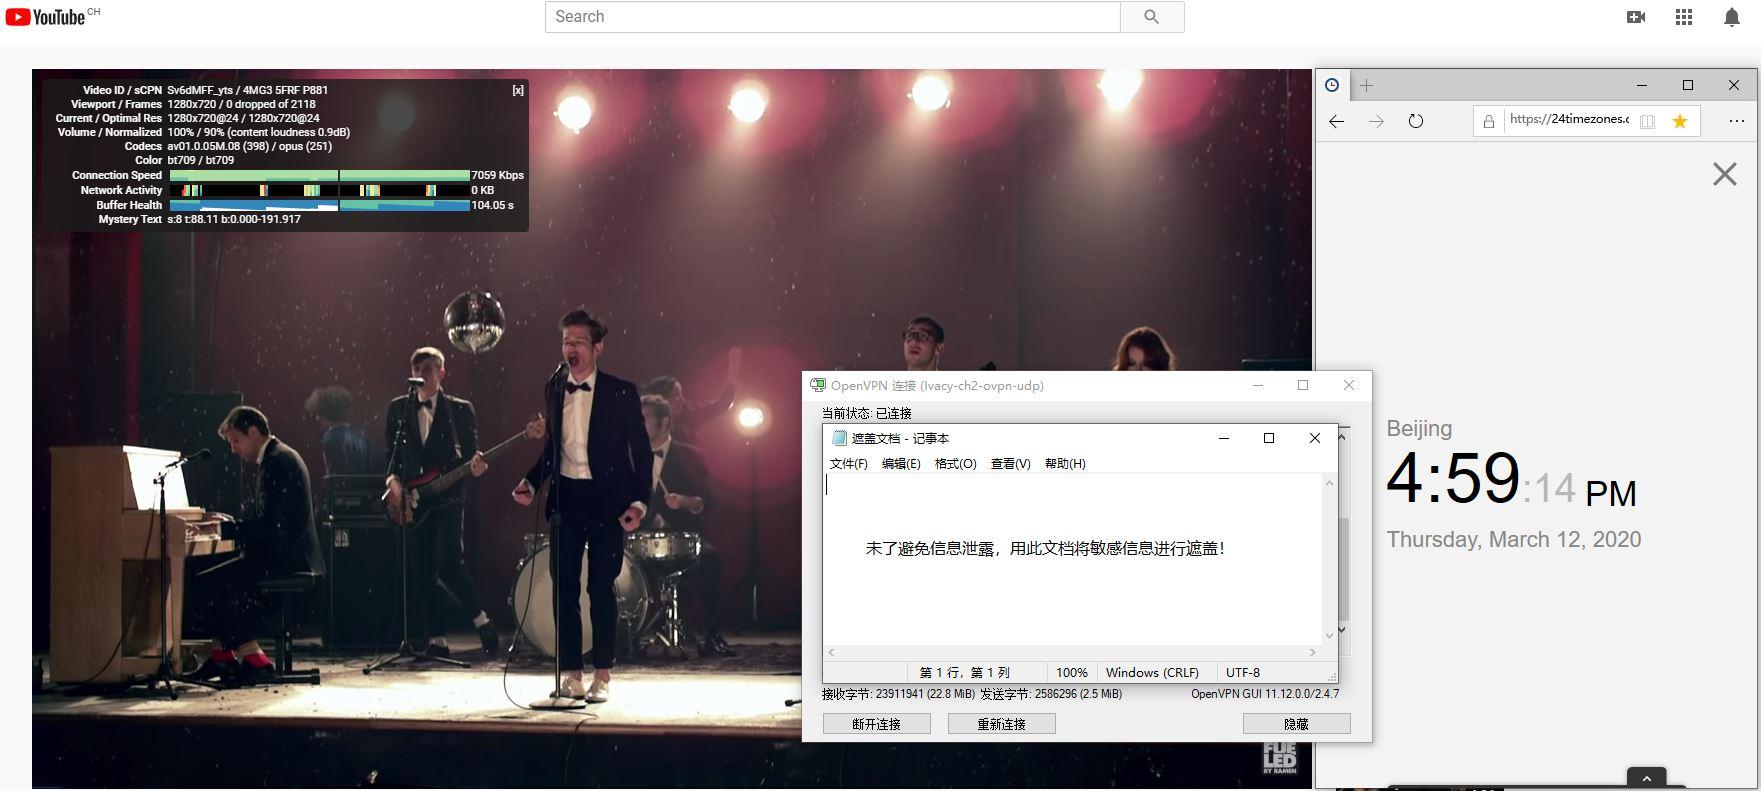 Windows10 IvacyVPN OpenVPN CH-2 中国VPN翻墙 科学上网 Youtube测速 - 20200312